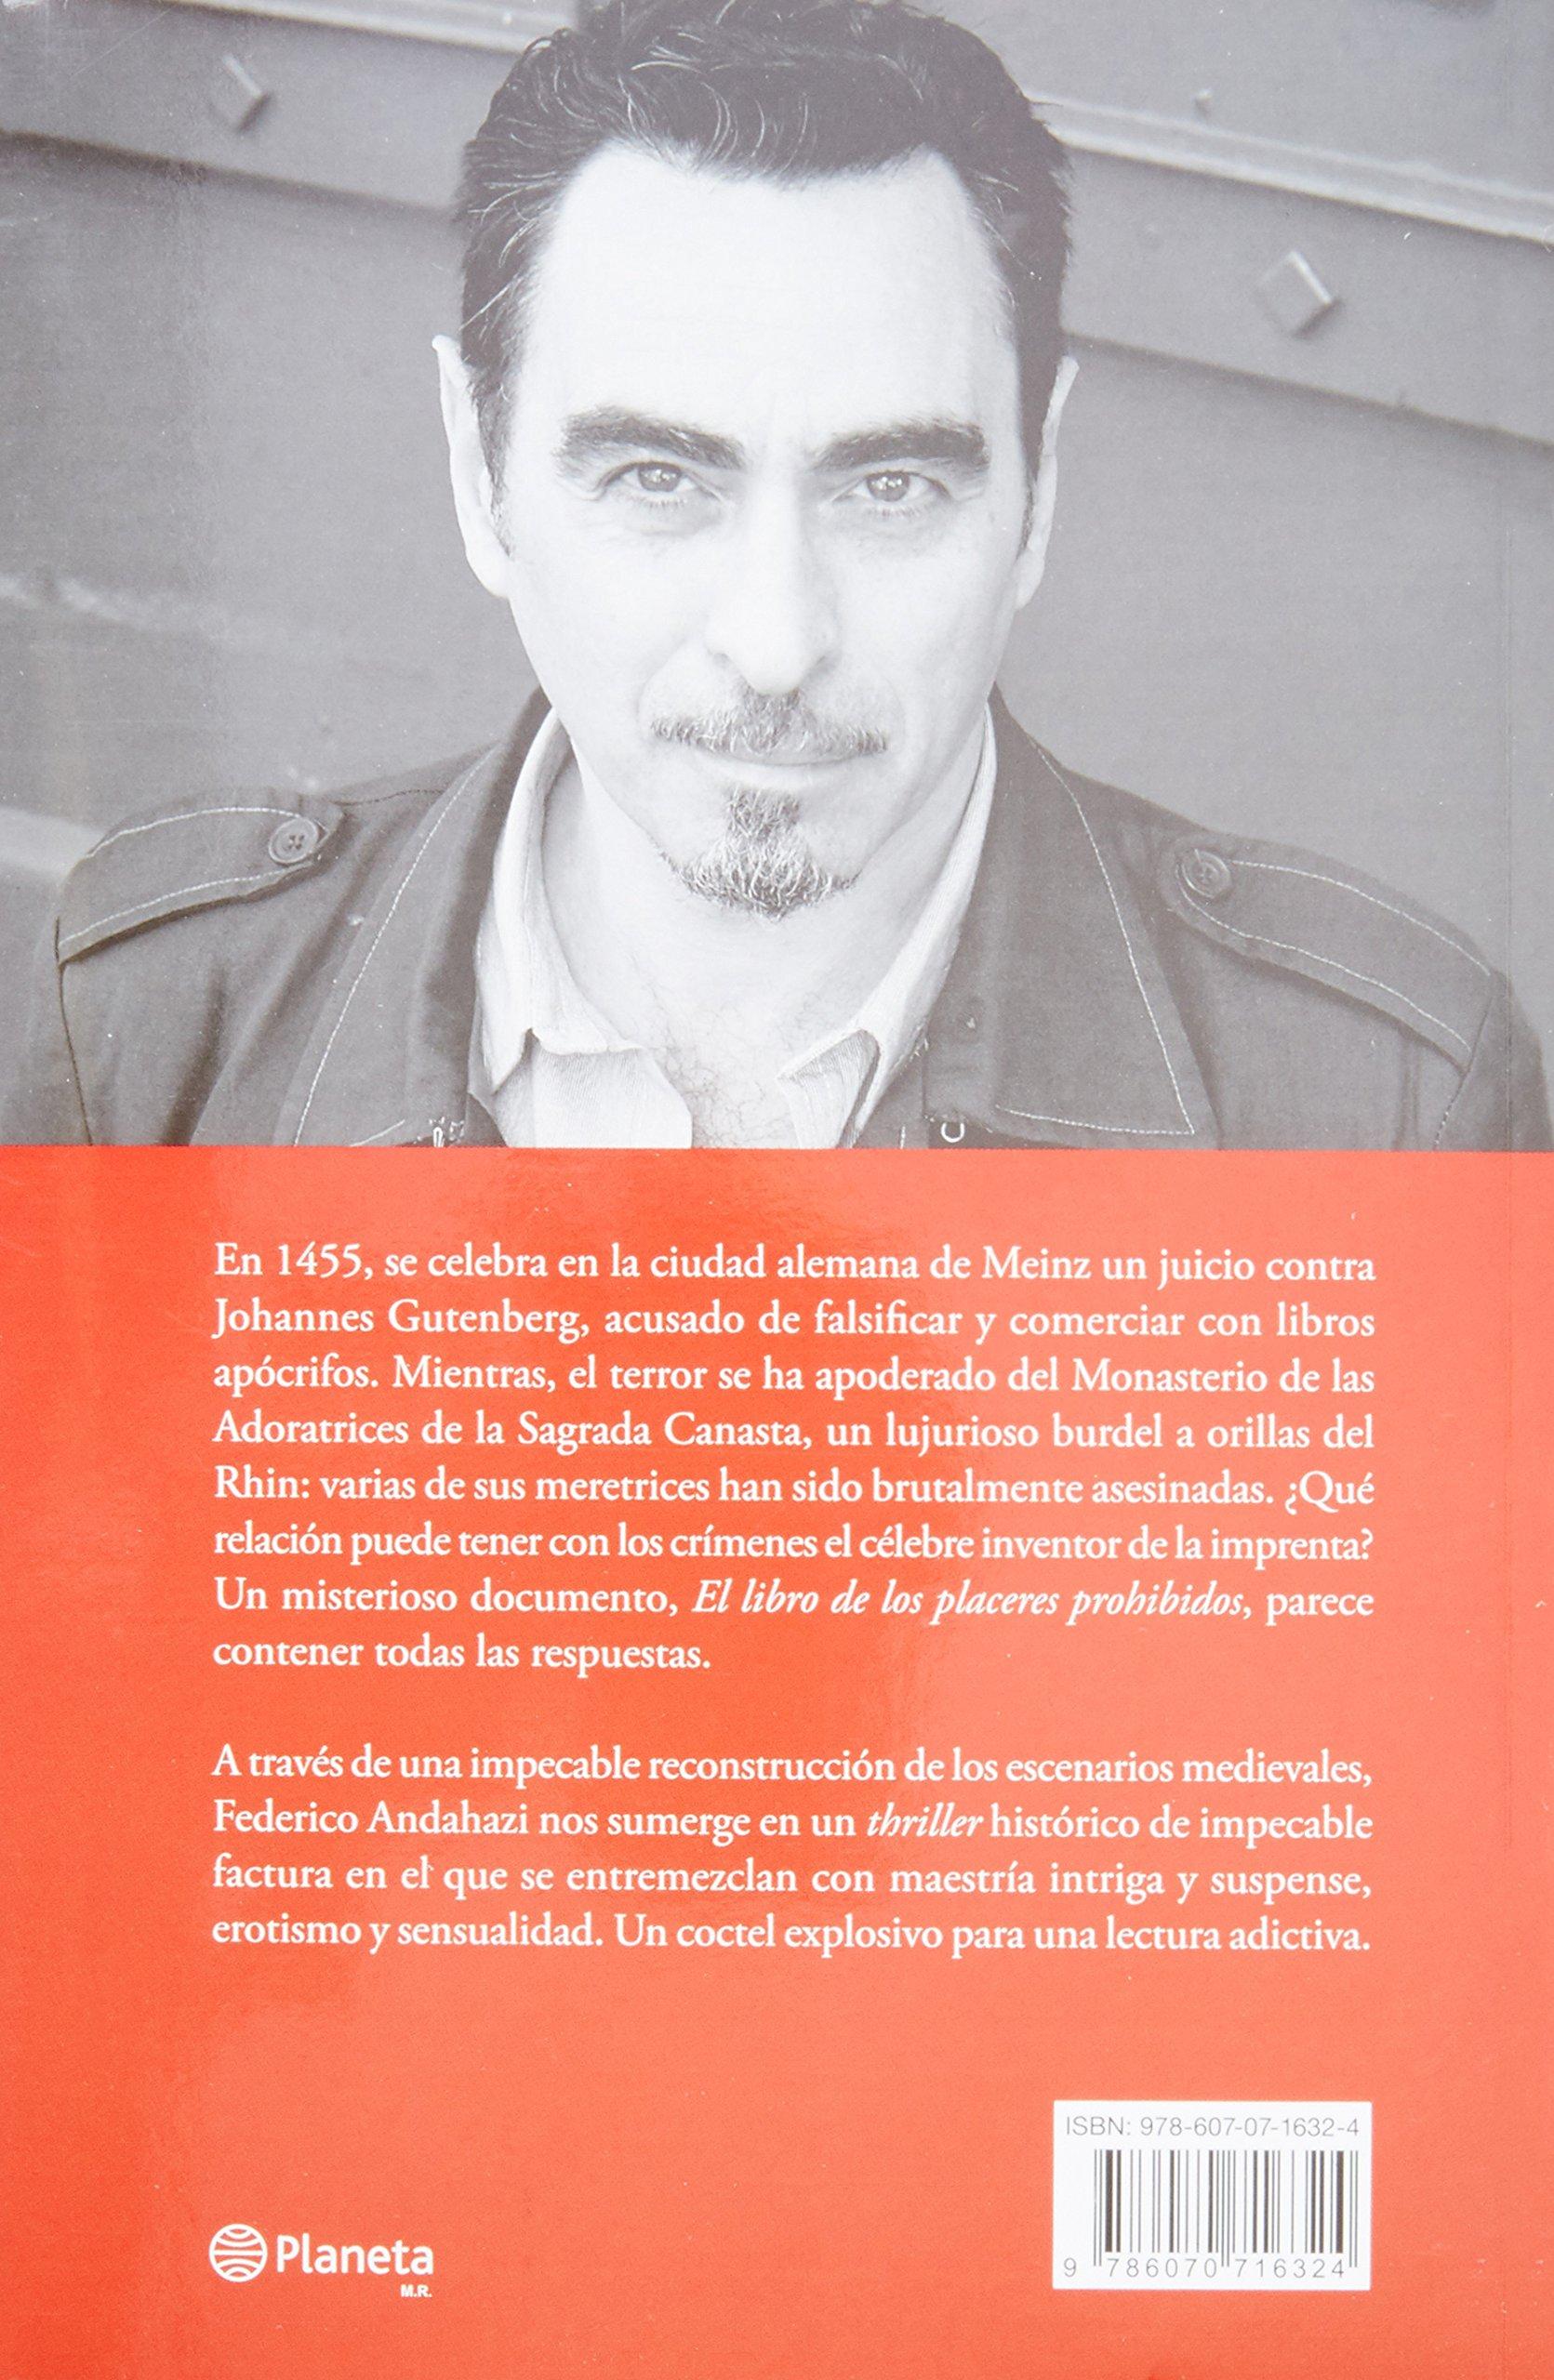 El libro de los placeres prohibidos spanish edition federico andahazi 9786070716324 amazon com books